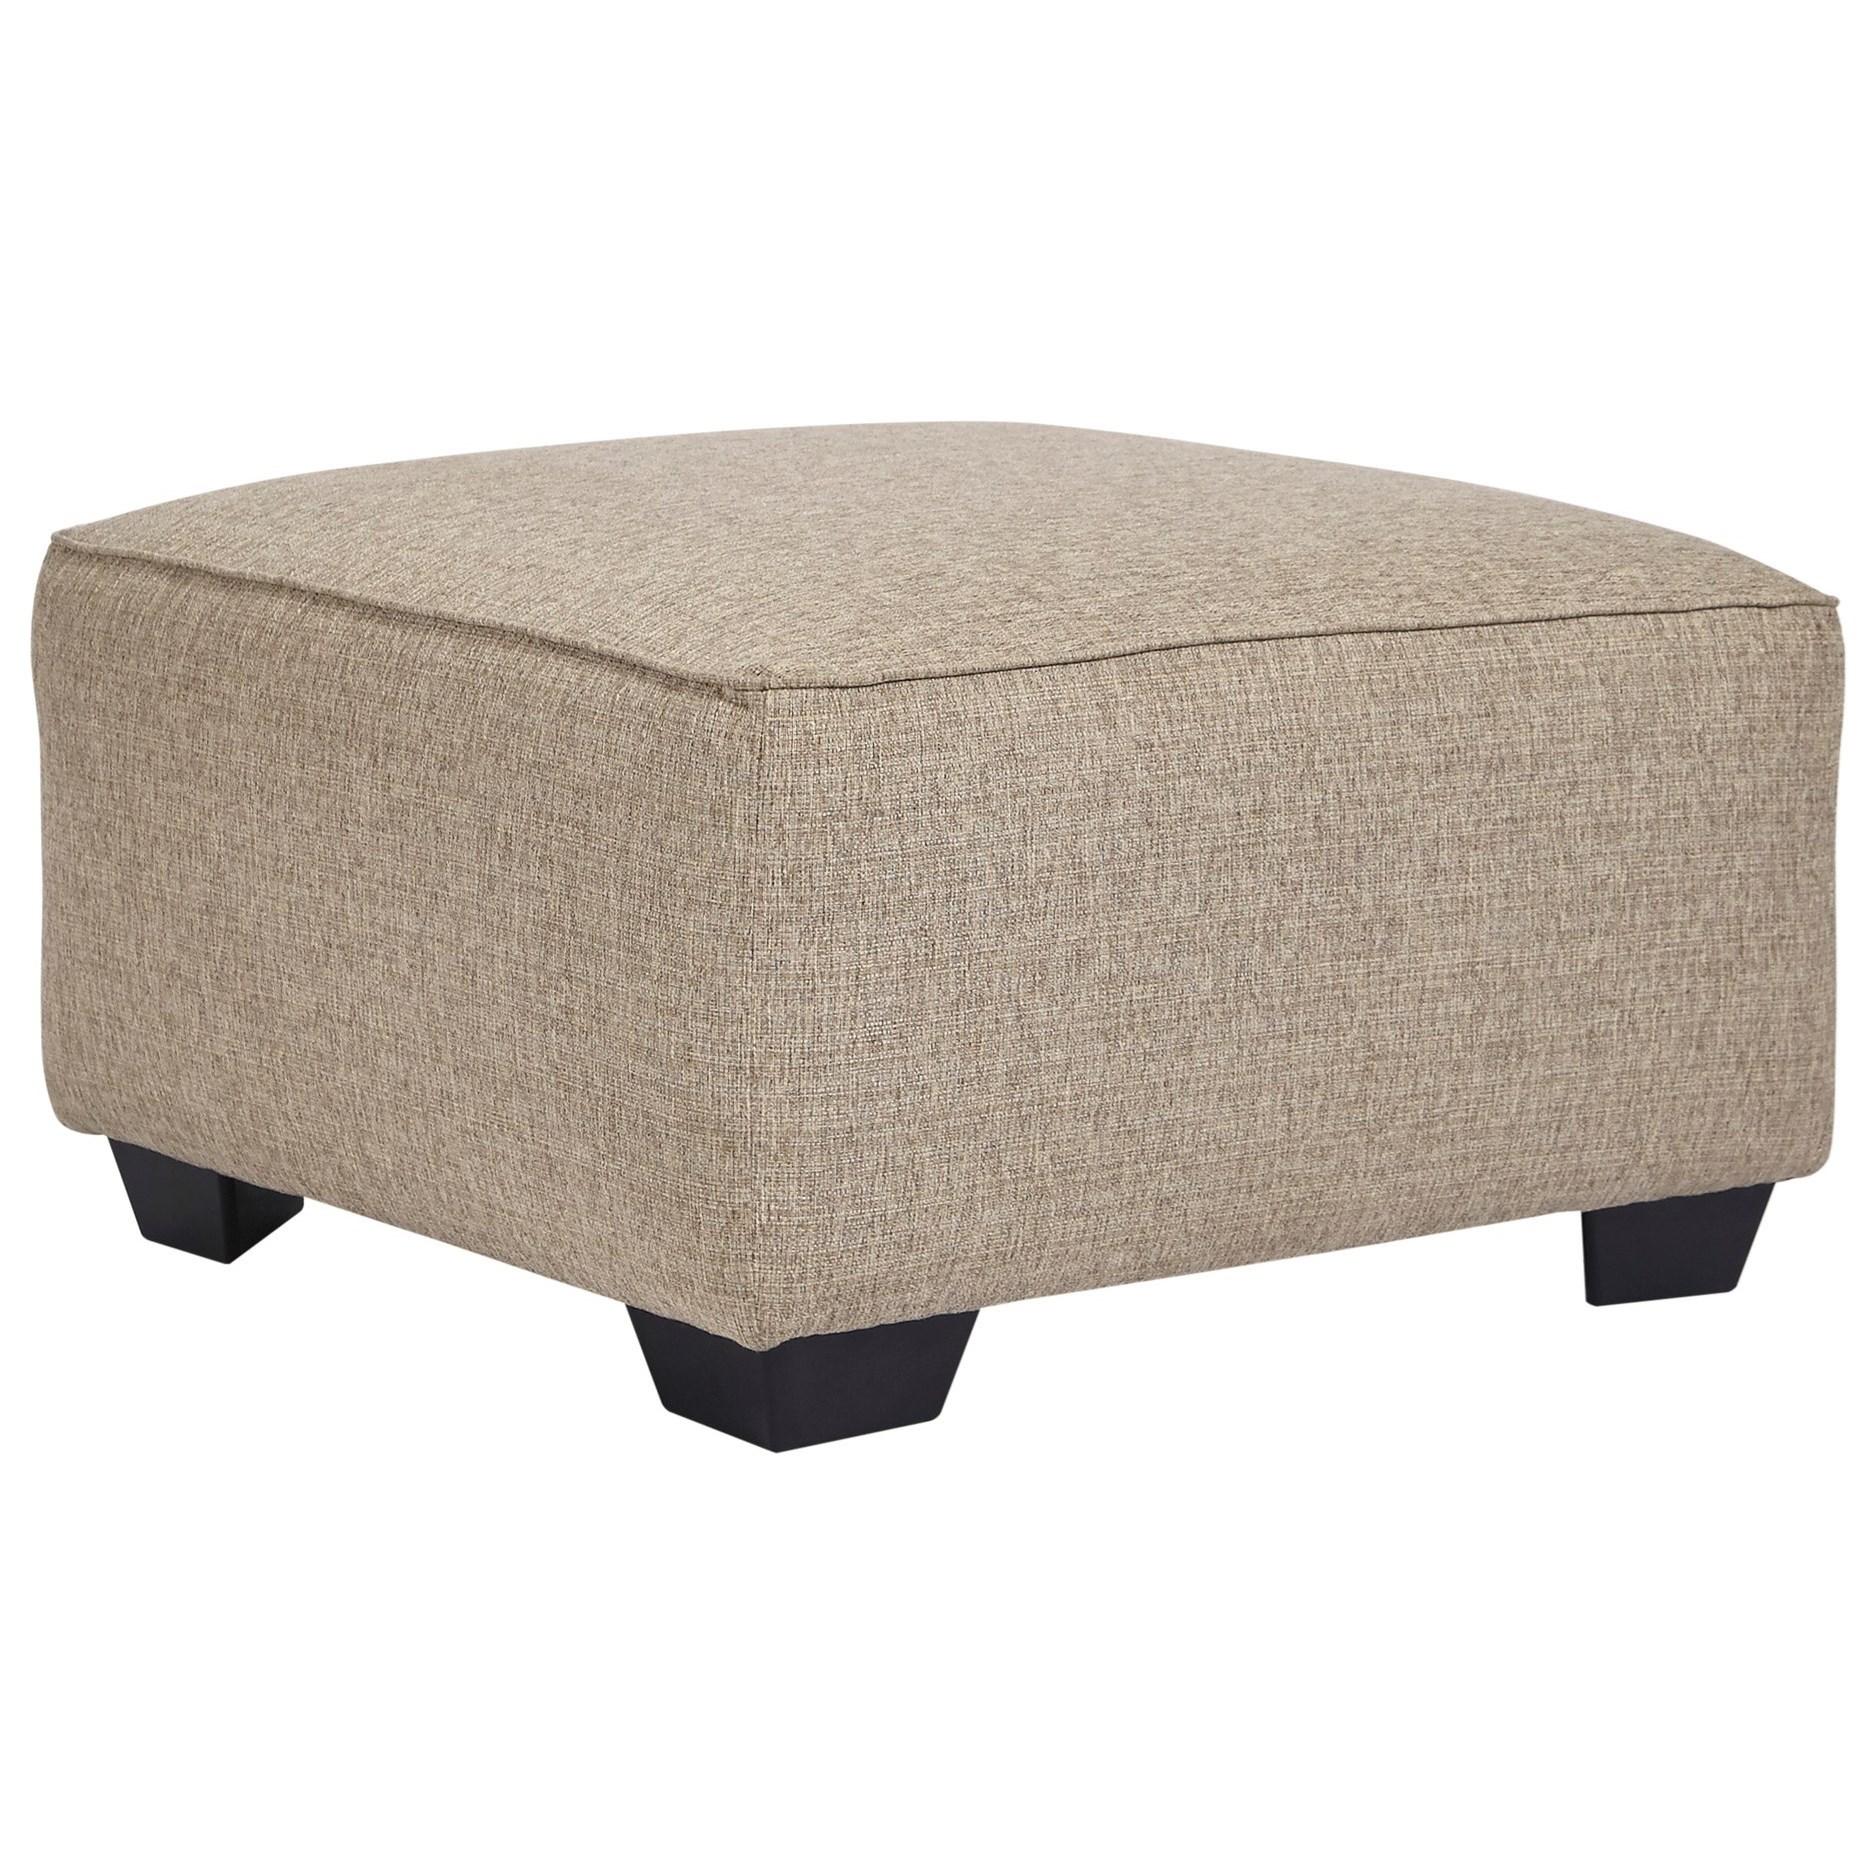 Baceno Oversized Accent Ottoman by Ashley Furniture at Houston's Yuma Furniture